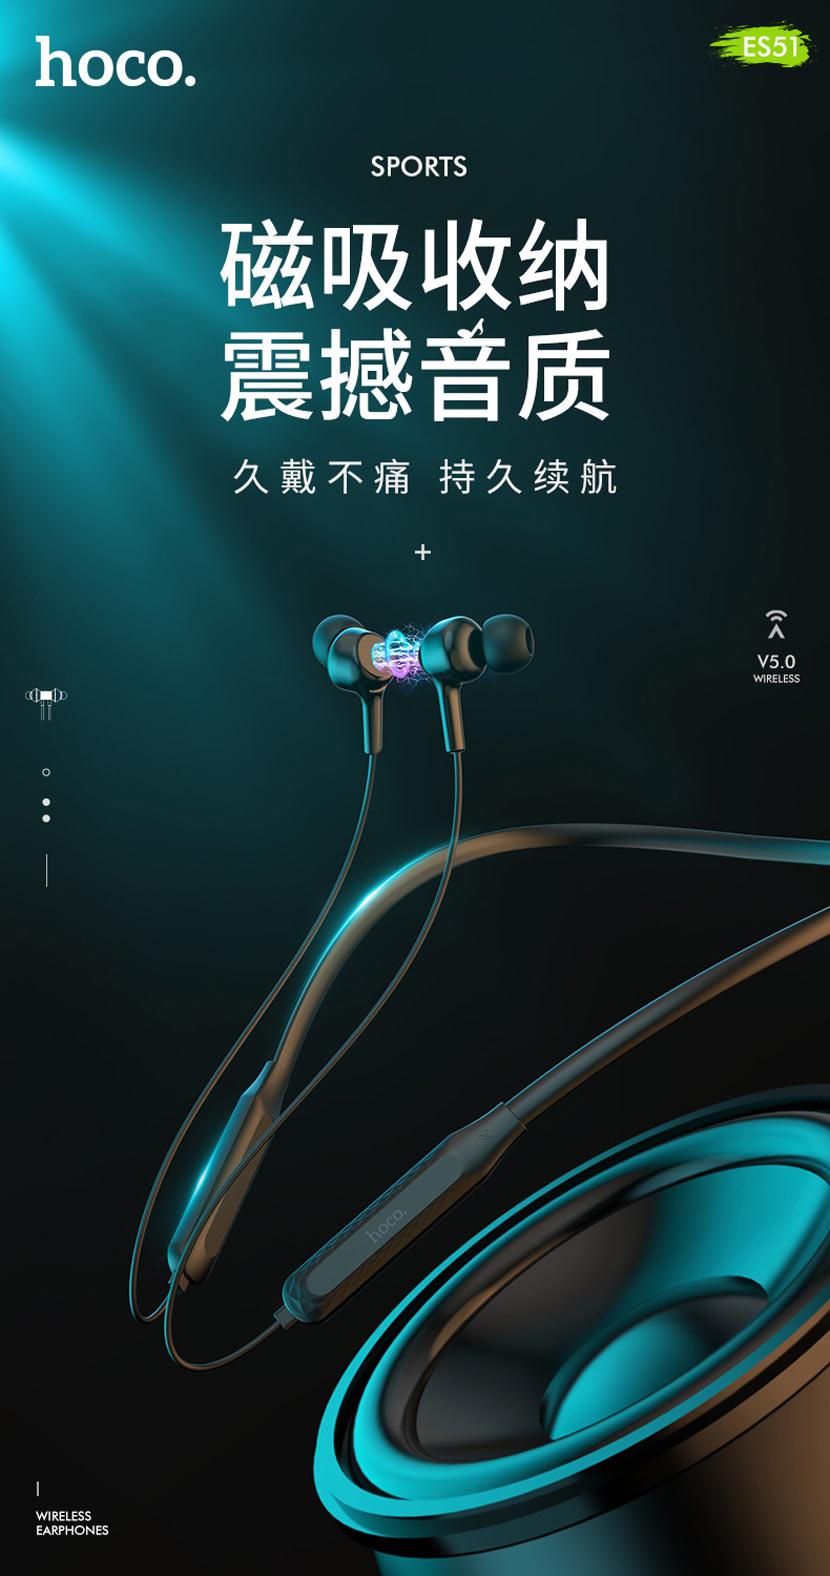 hoco news es51 era sports wireless earphones cn